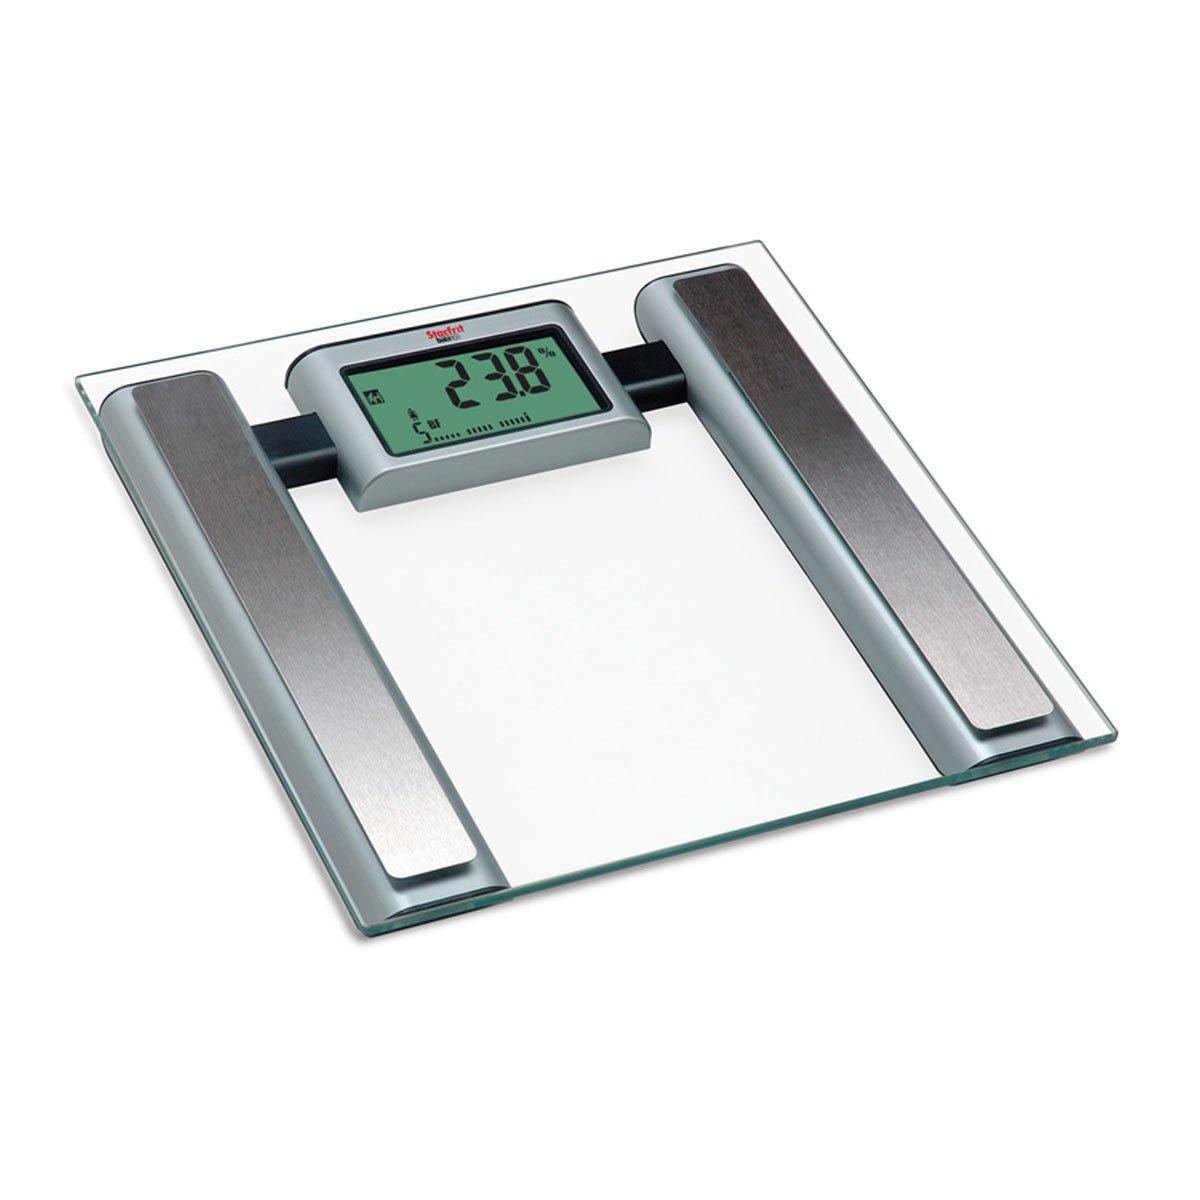 Bathroom scale body fat - Starfrit Balance 093836 Body Fat Electronic Bathroom Scale Amazon Ca Home Kitchen